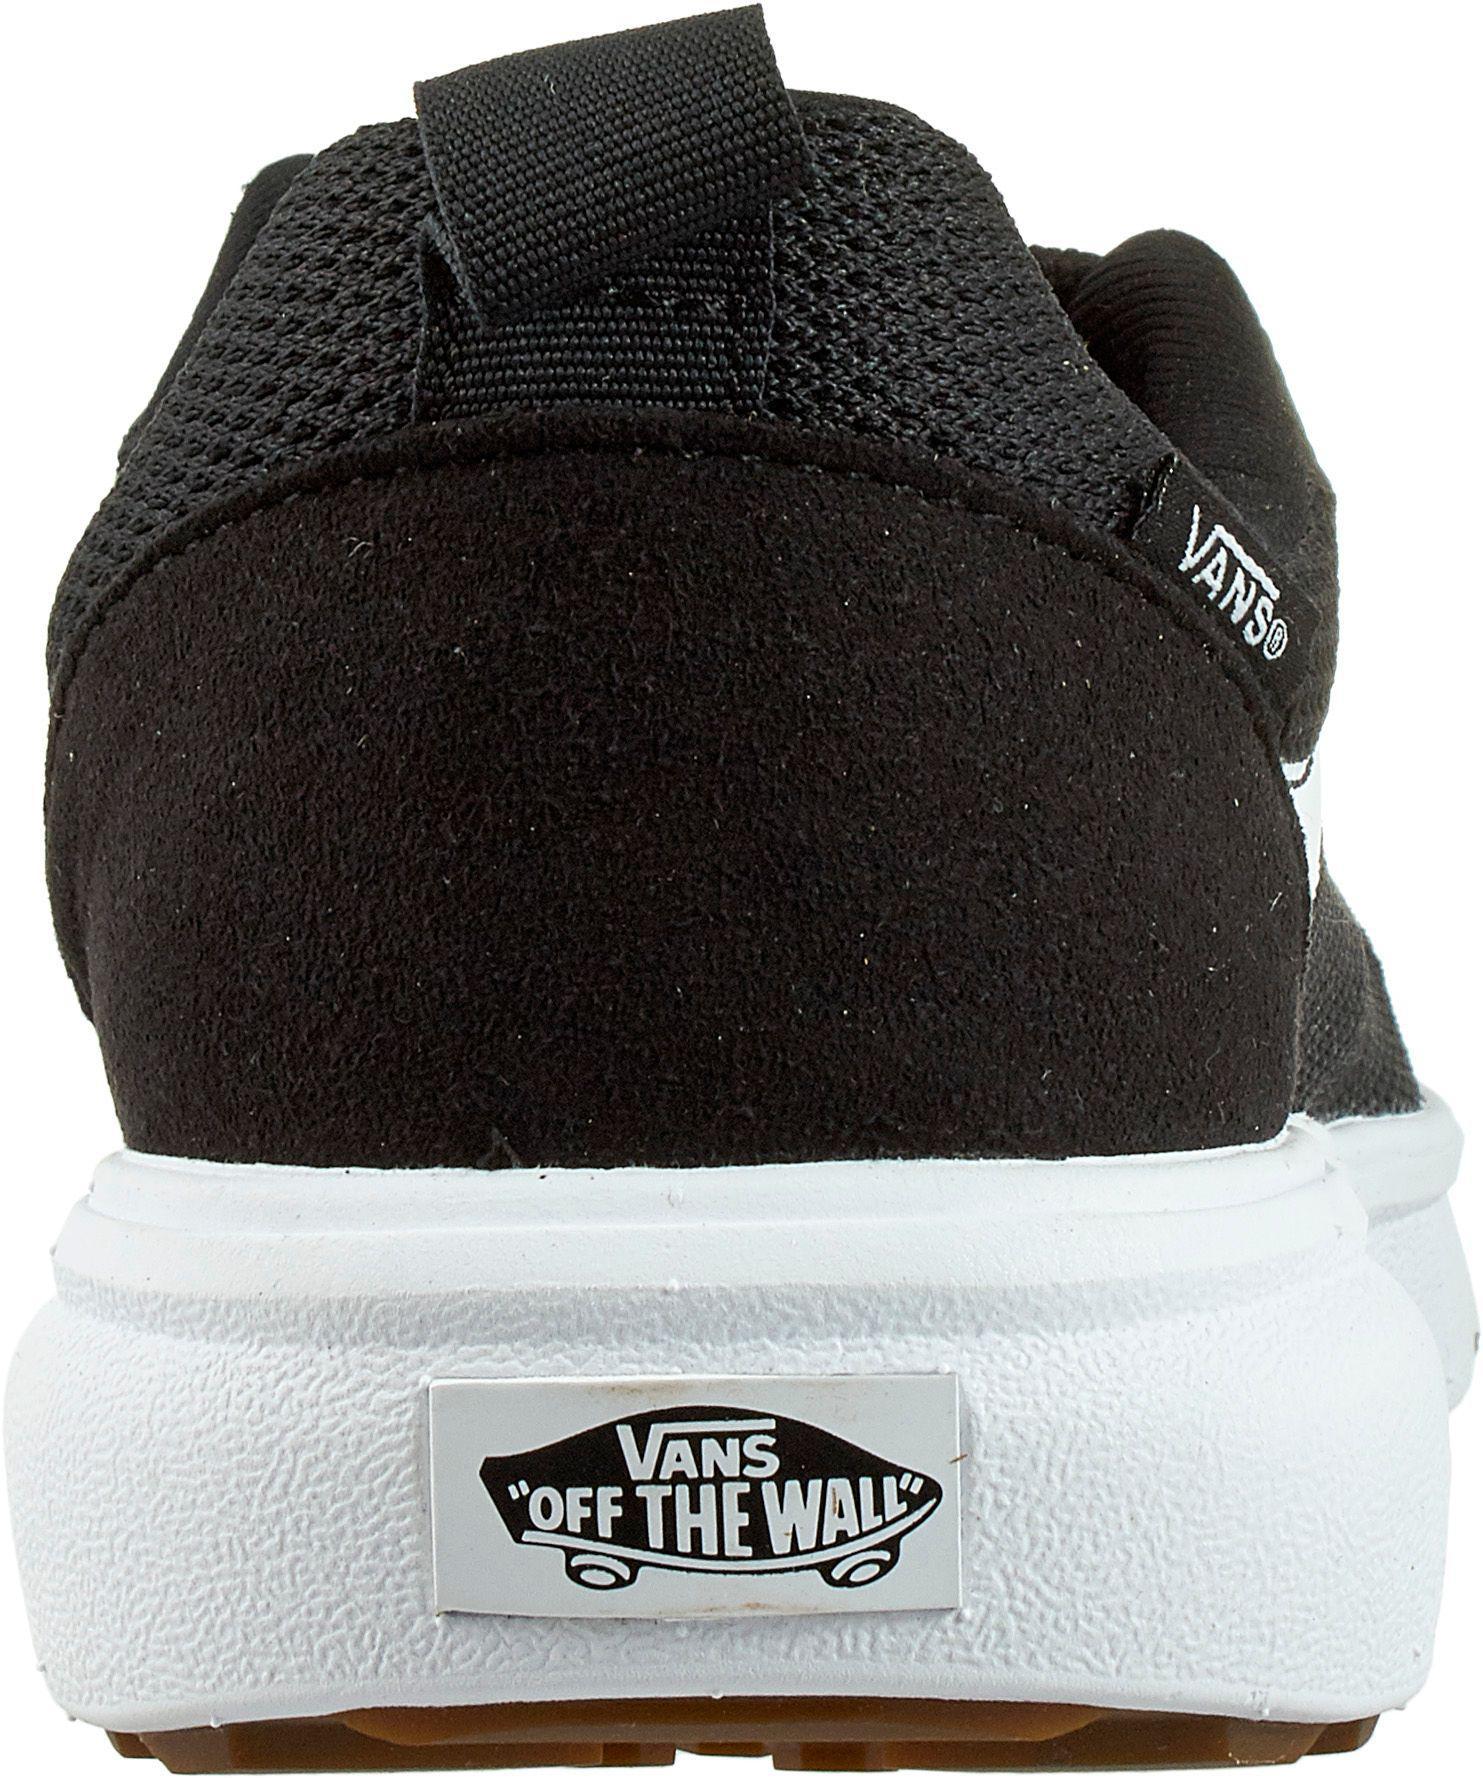 2178eb193ffa79 Lyst - Vans Ultrarange Rapidweld Shoes in Black for Men